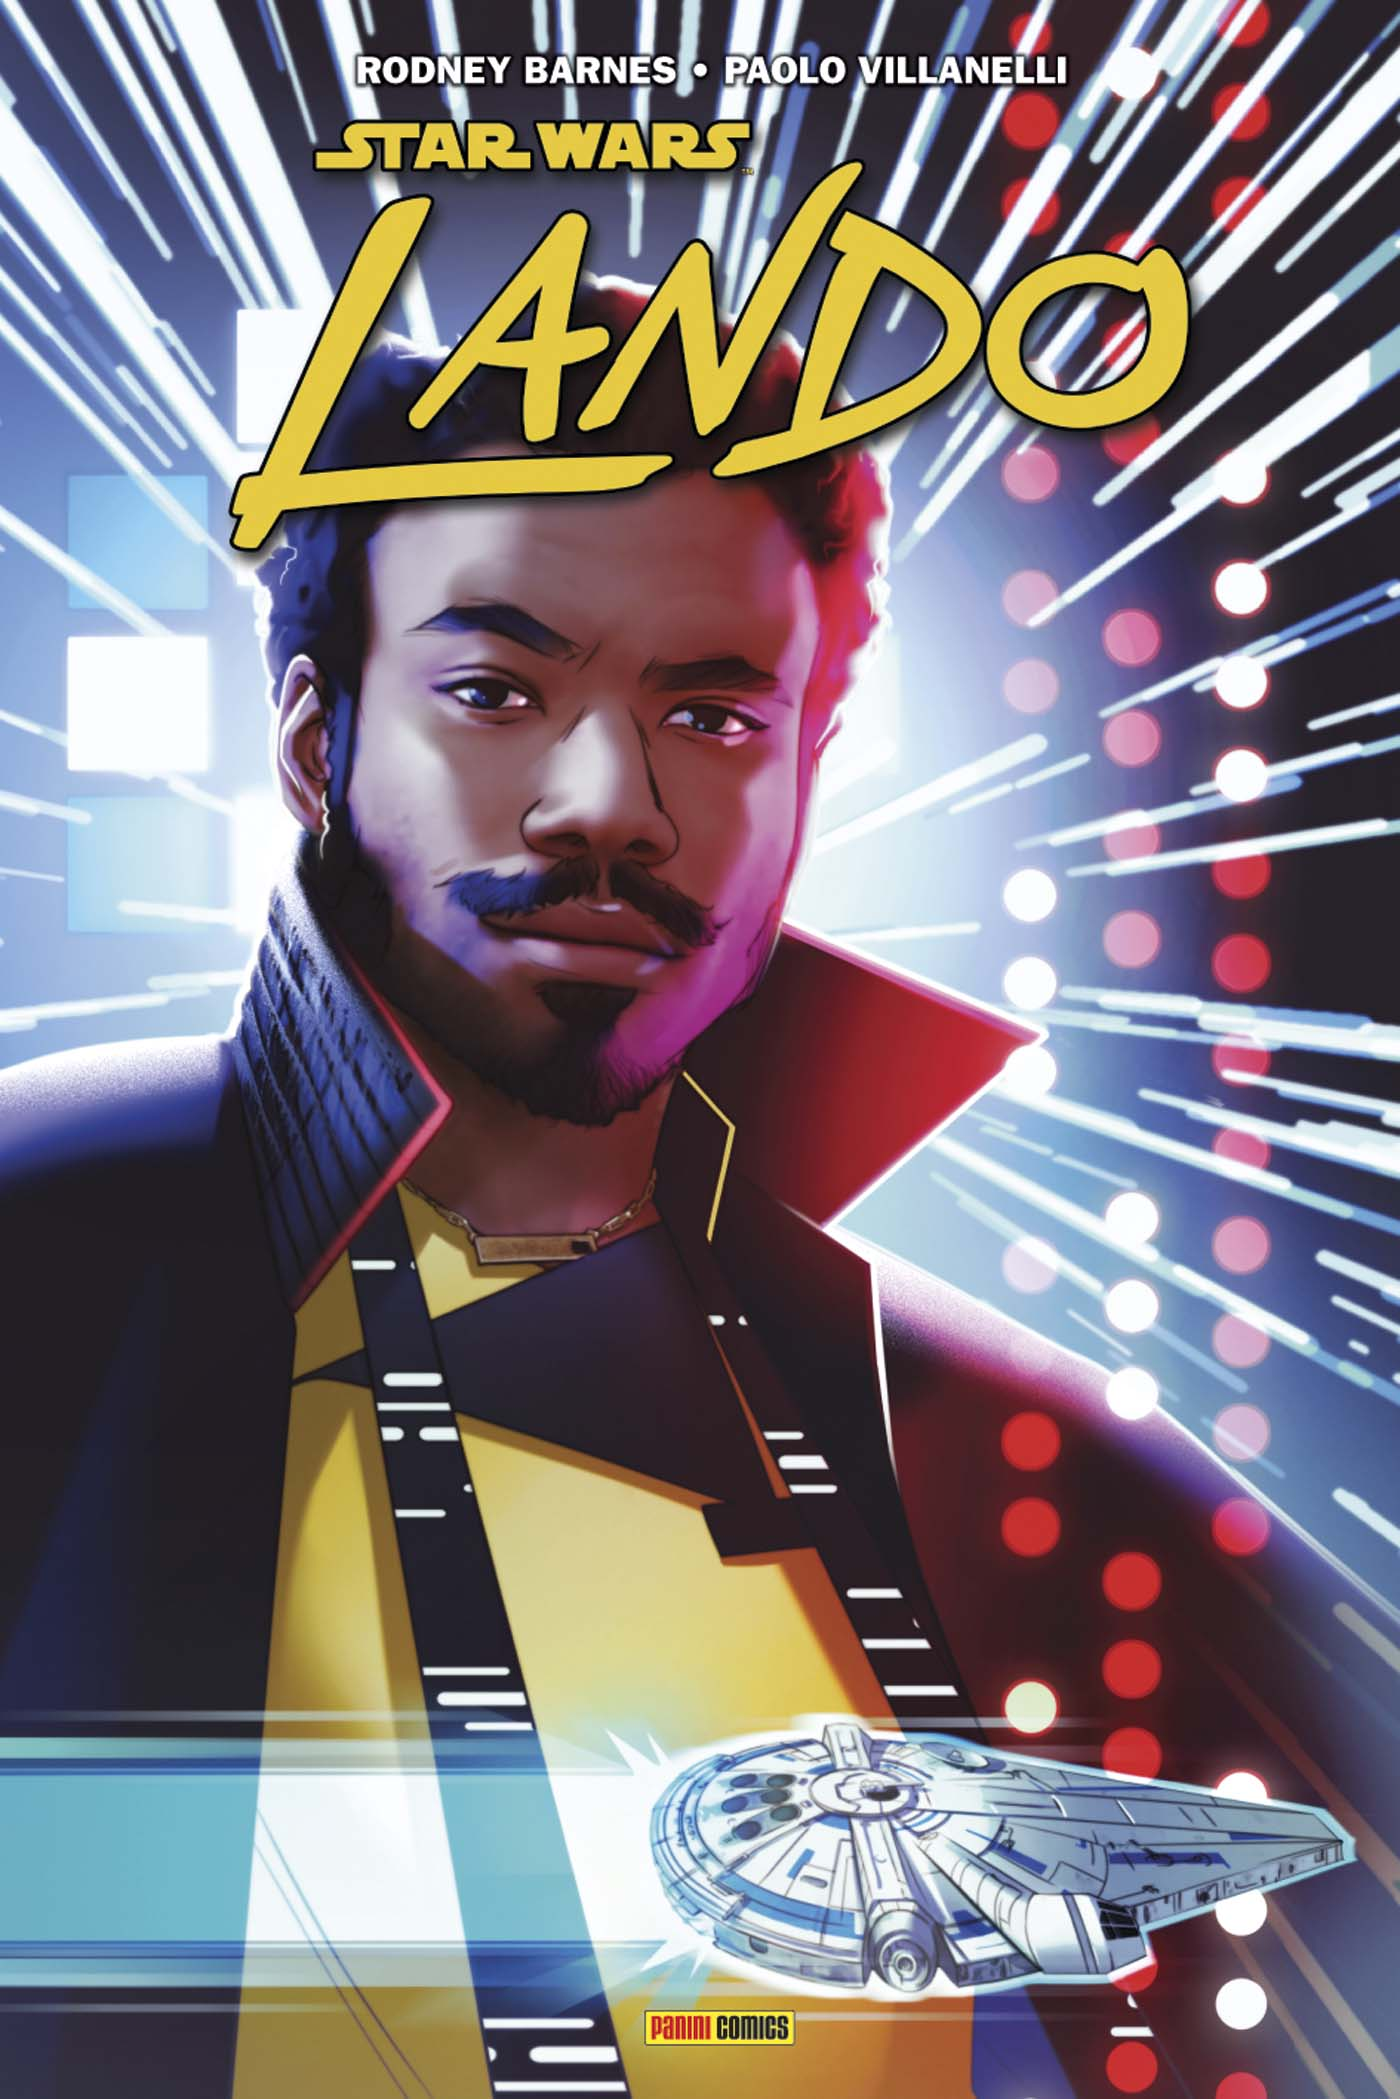 PAnini Lando quitte ou double